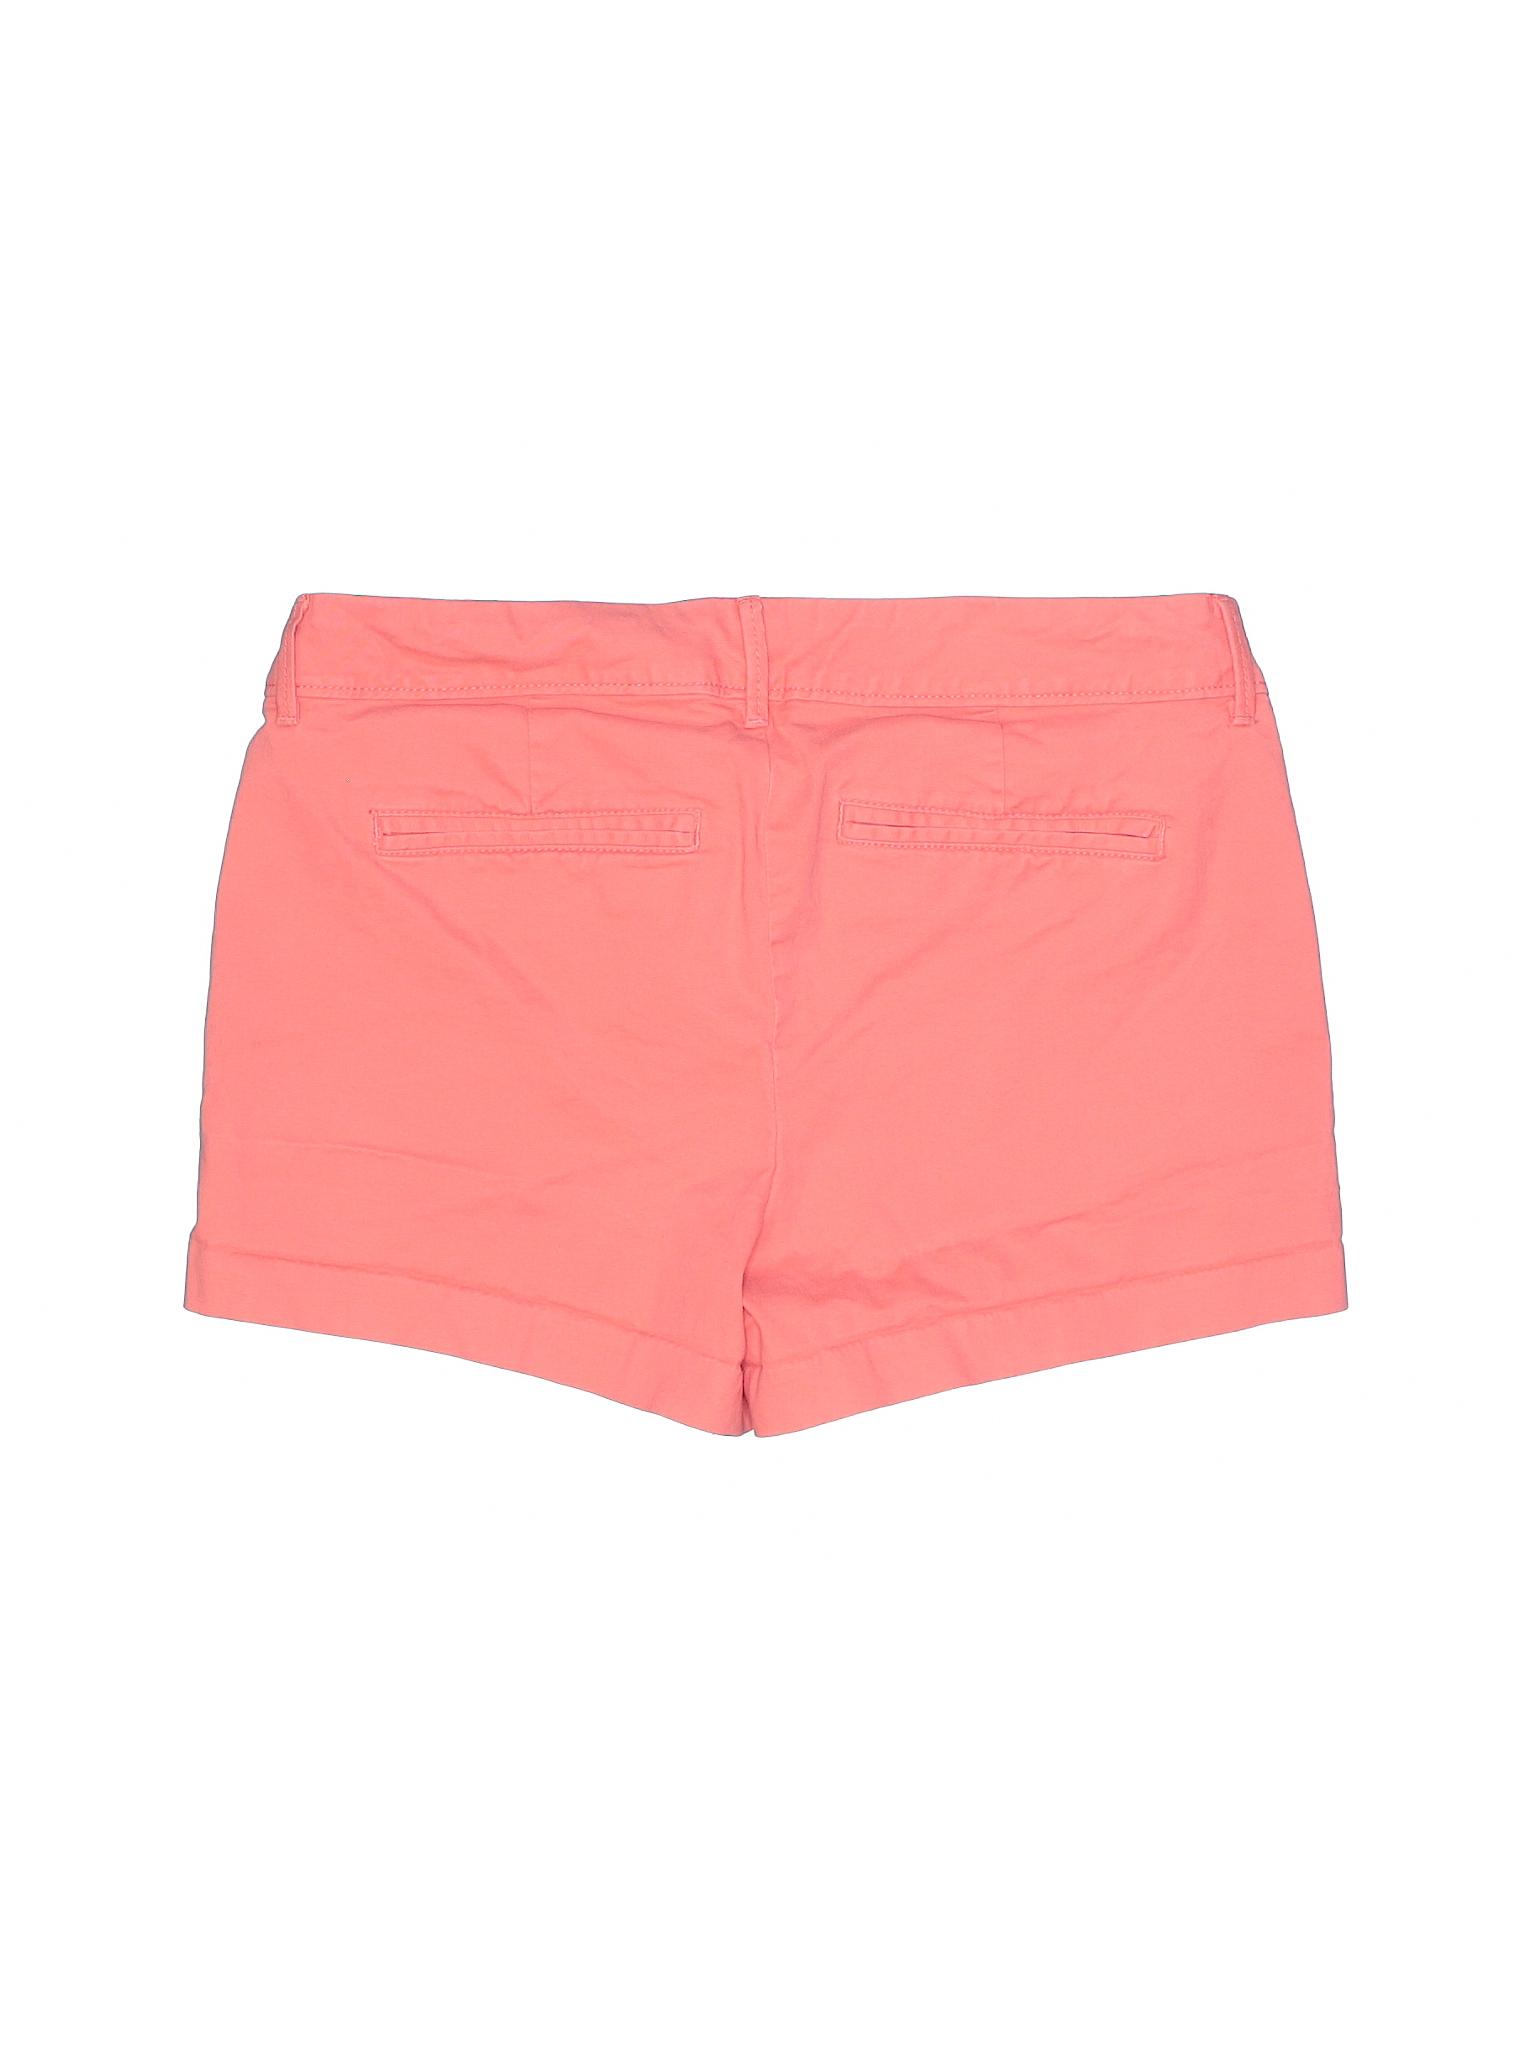 Boutique leisure Shorts Khaki Old Navy RUqRw